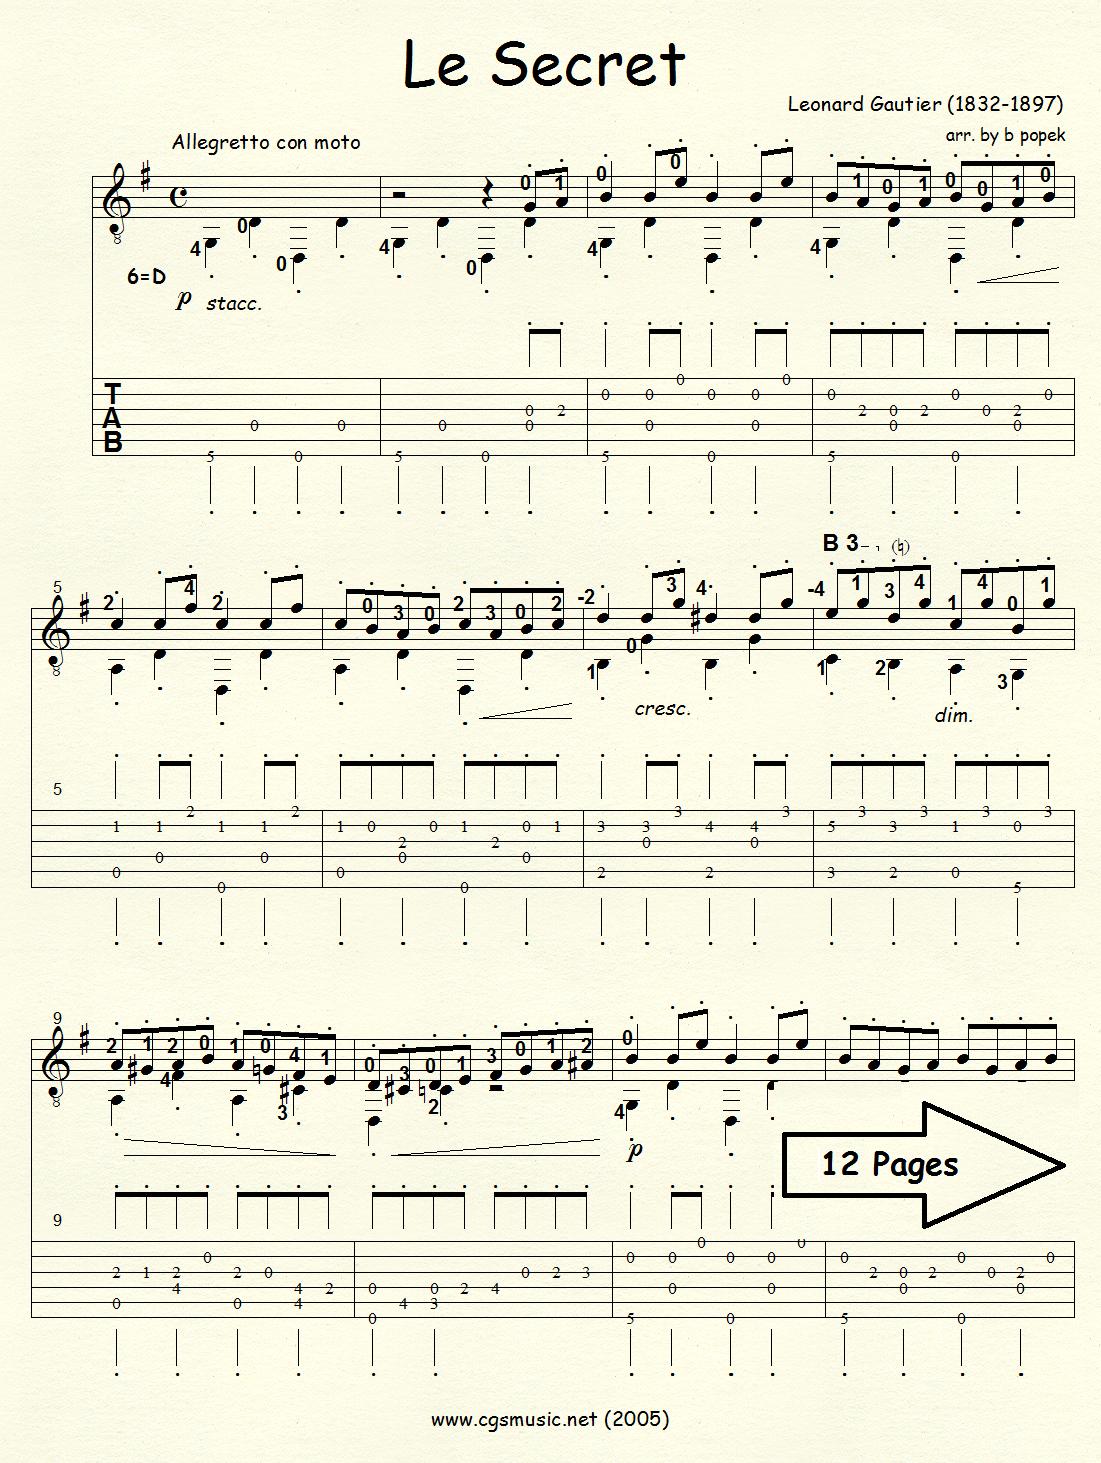 Le Secret (Gautier) for Classical Guitar in Tablature